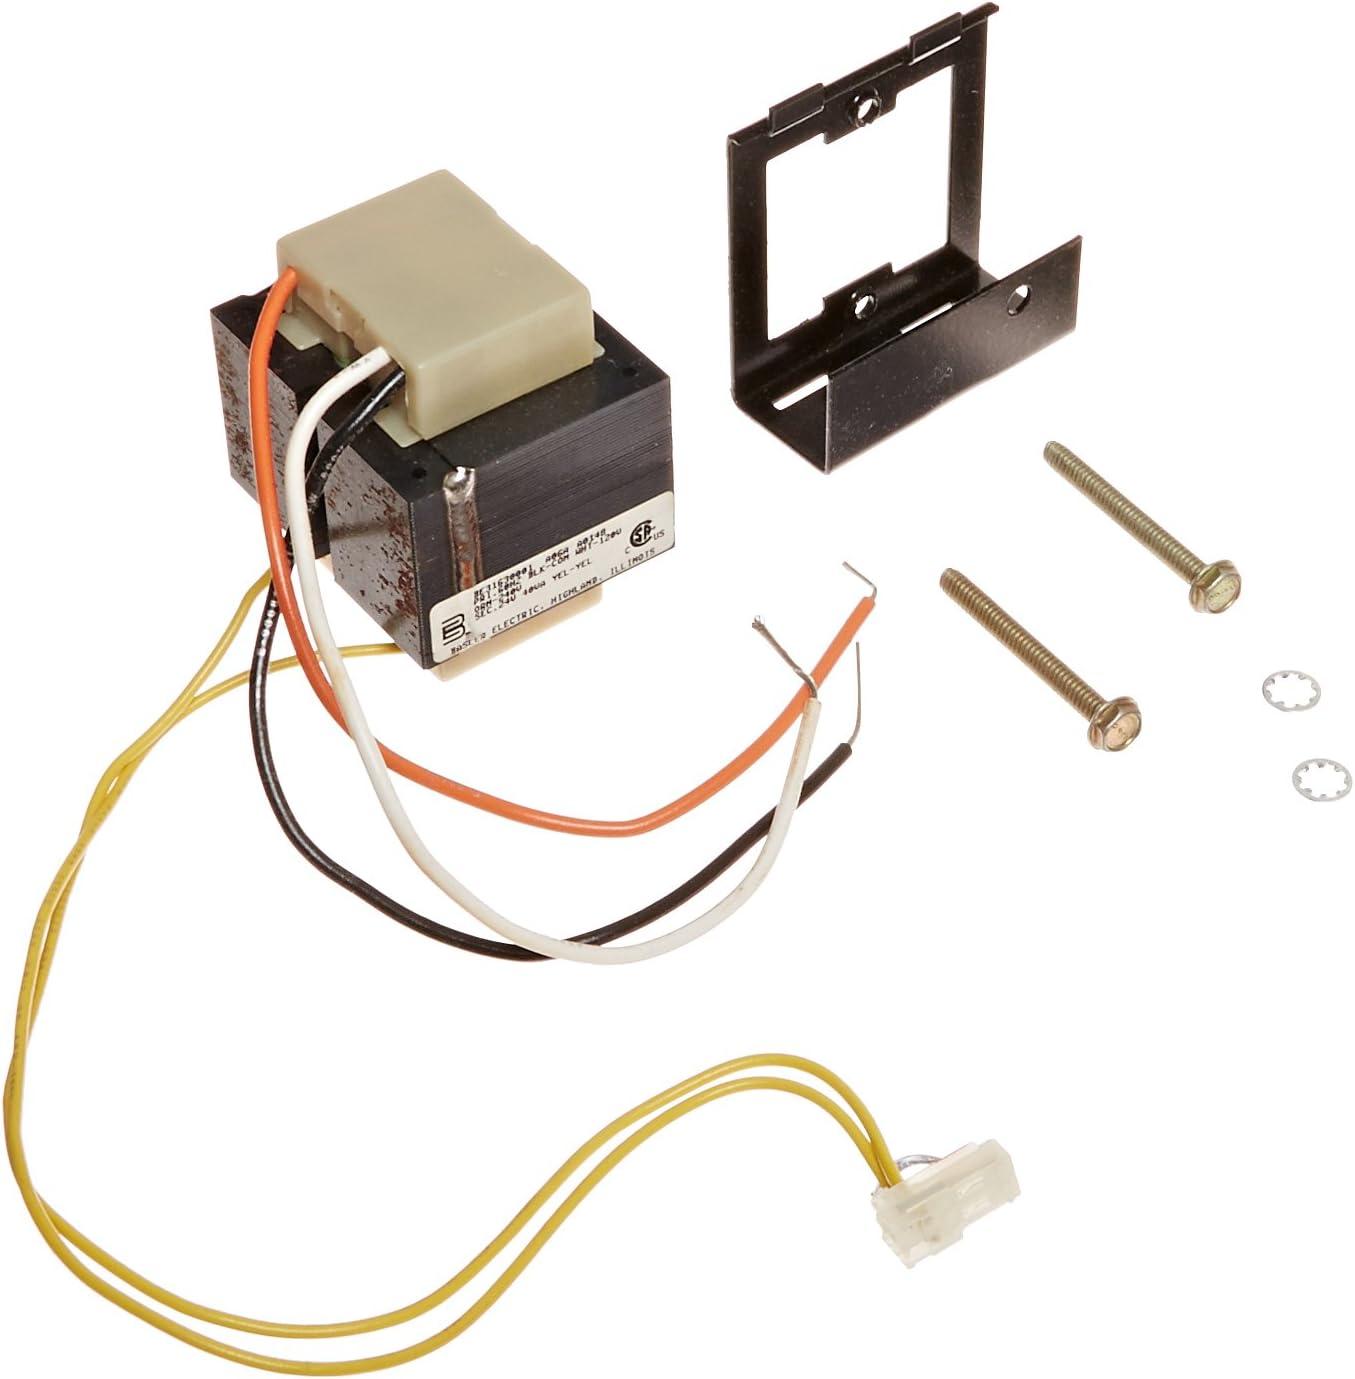 PENTAIR44401-0006 120   240 볼트 40-VA 변압기 보충 MAXPLUS 수영장 제어 시스템